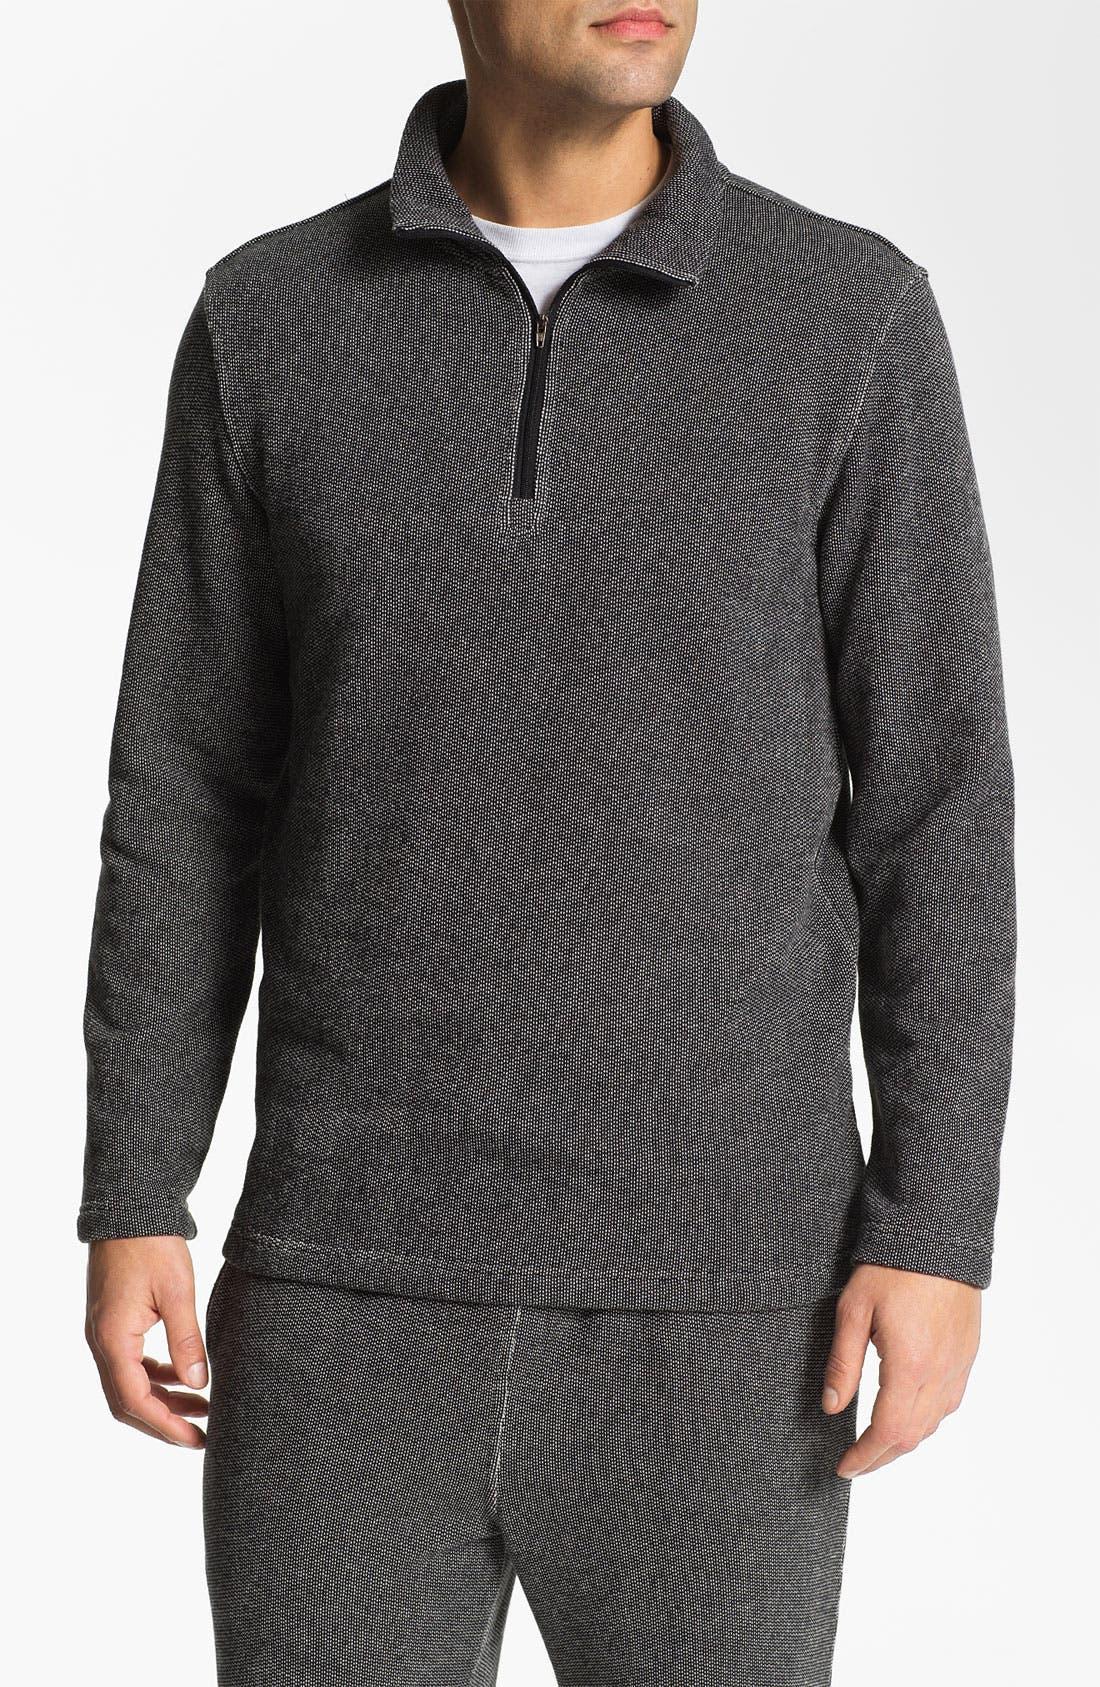 Alternate Image 1 Selected - Daniel Buchler Quarter Zip Textured Cotton Blend Sweatshirt